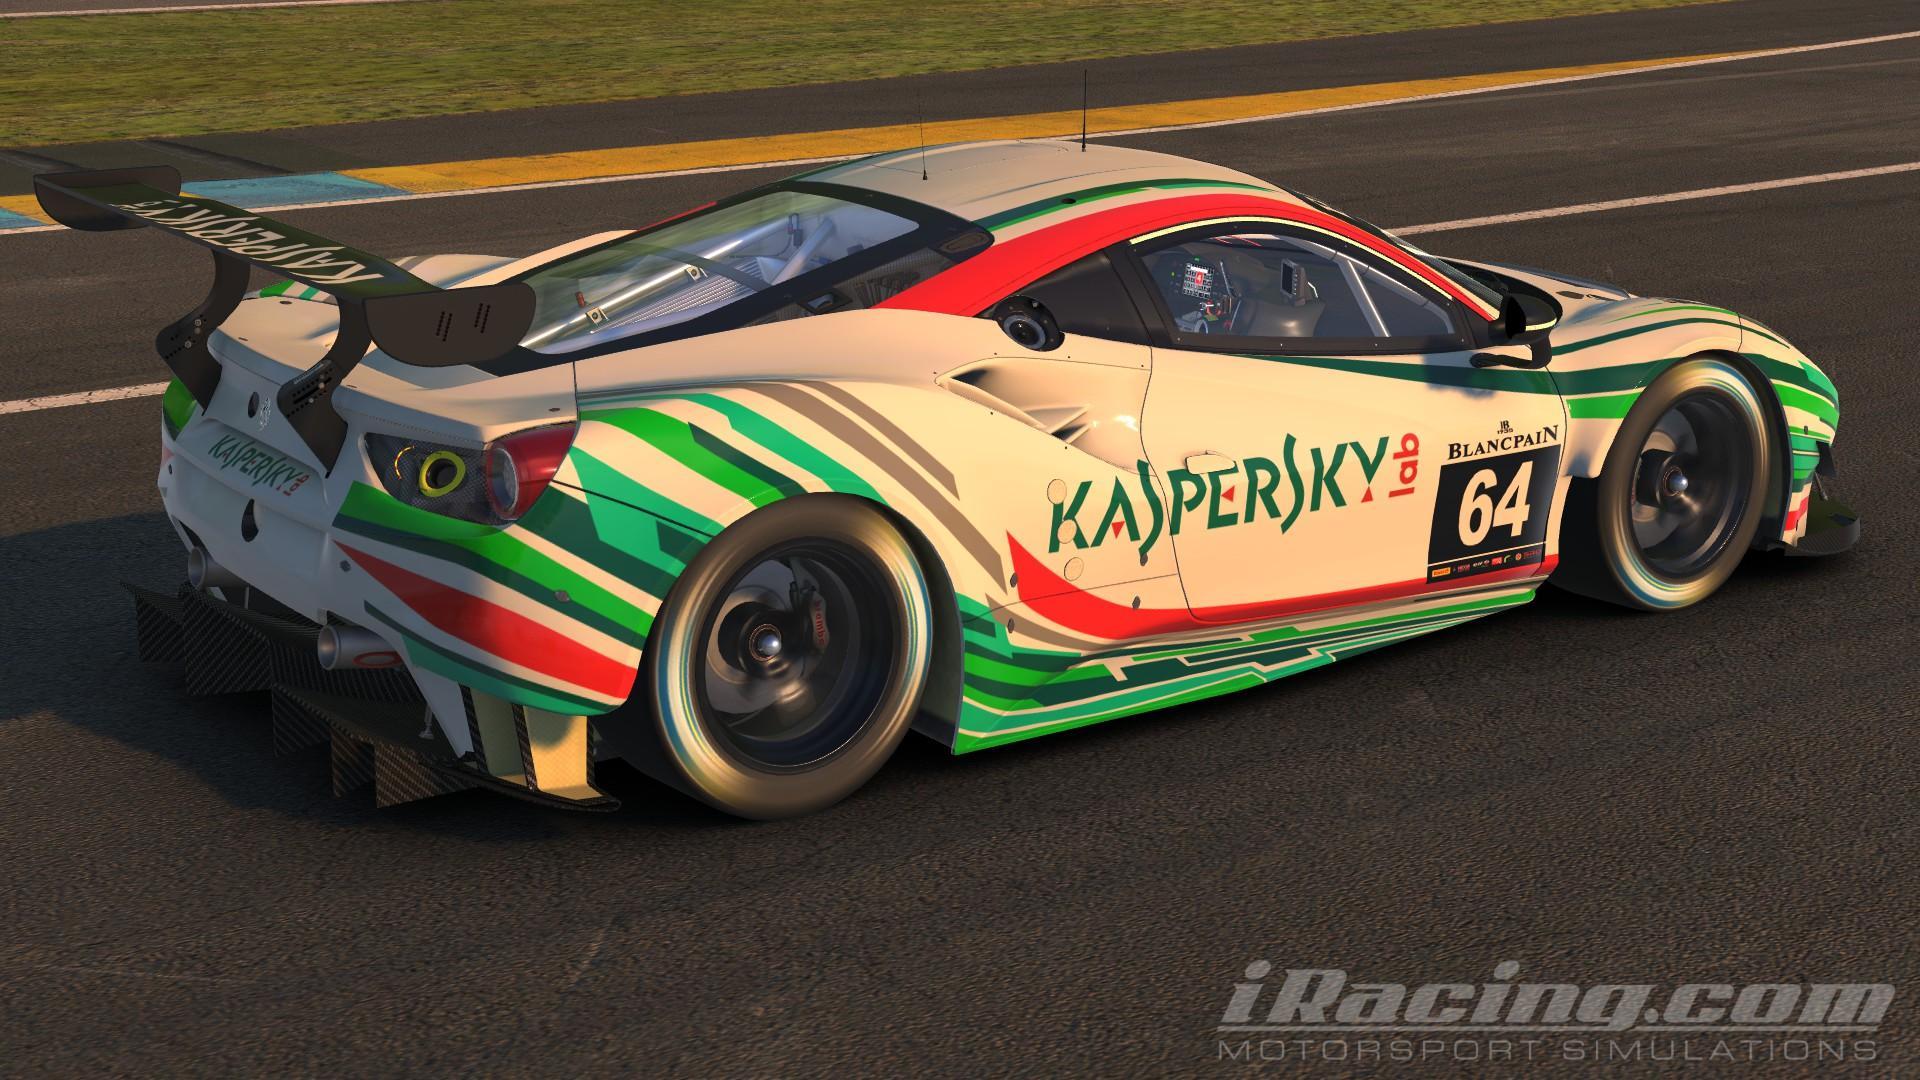 Preview of Kaspersky Motorsports 488 GTE by Dennis Gerressen